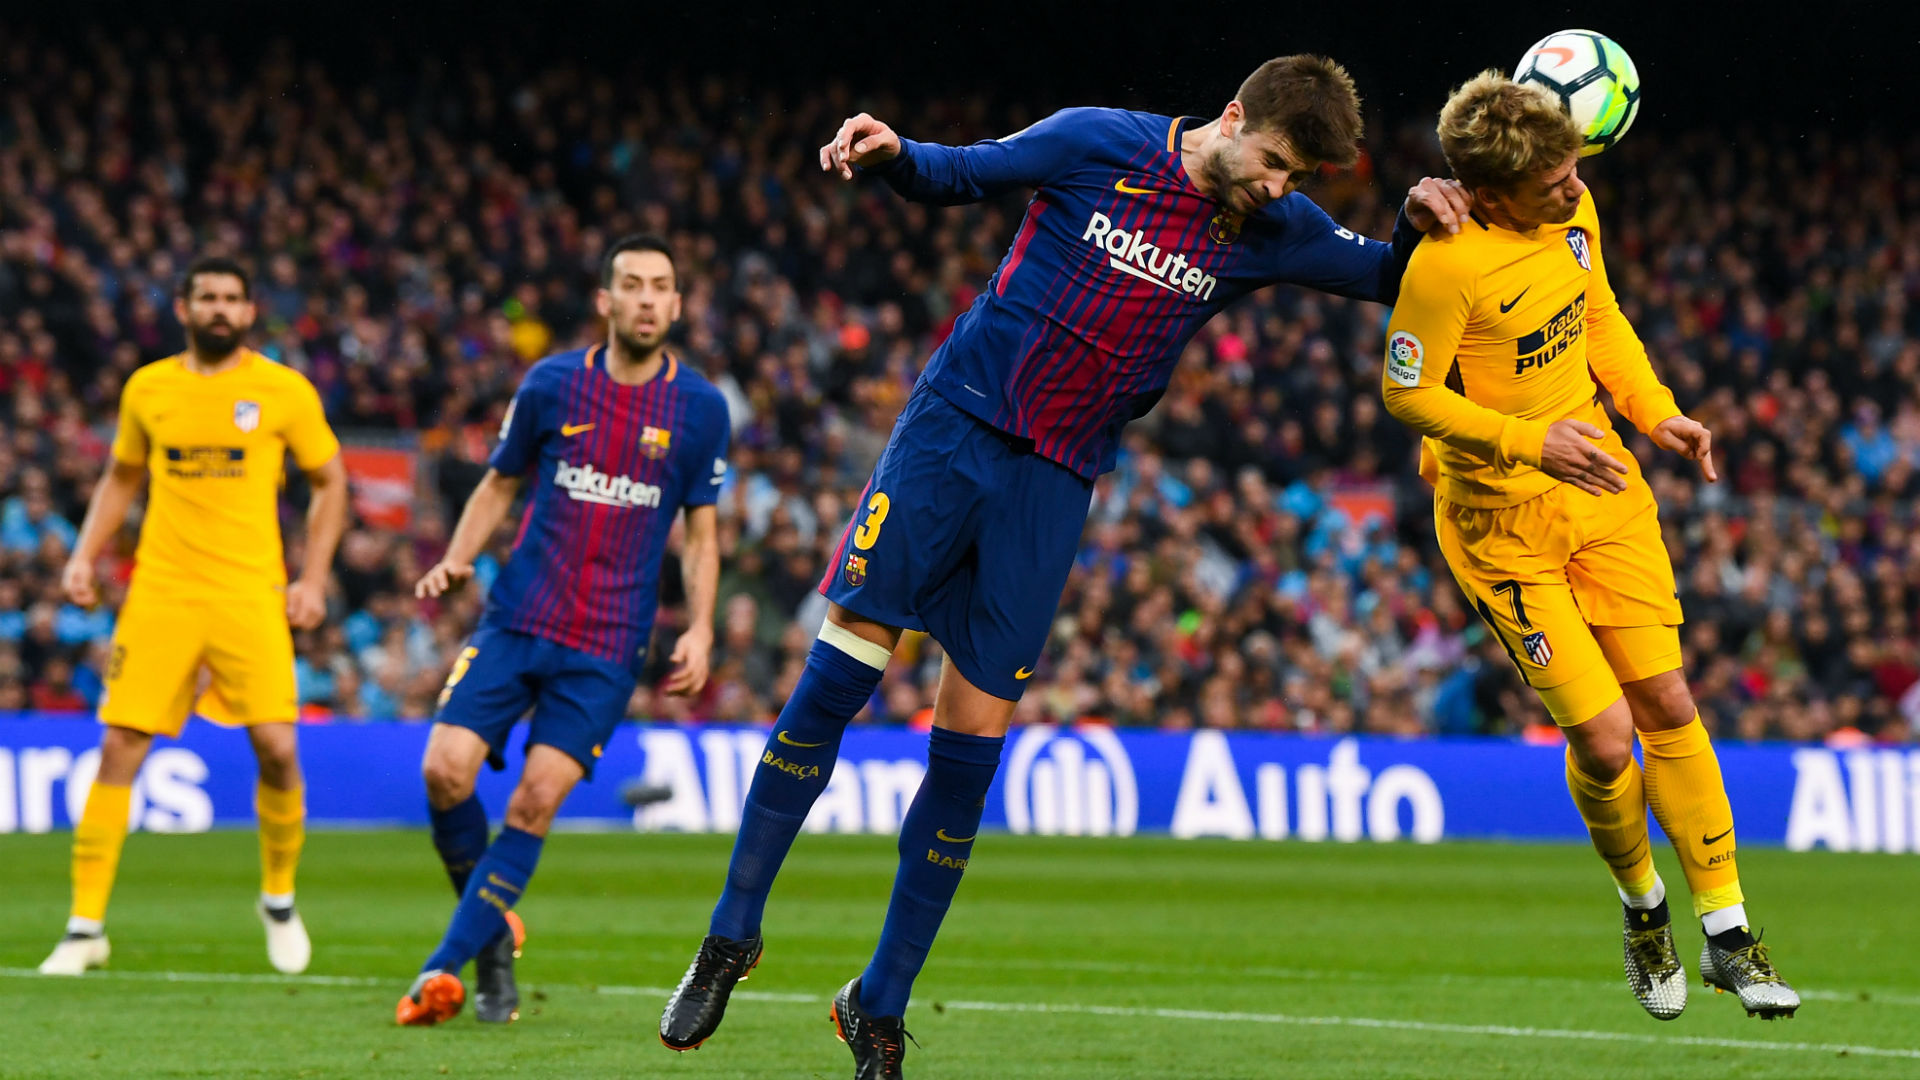 Прогноз на 30.01.2019. Барселона - Севилья